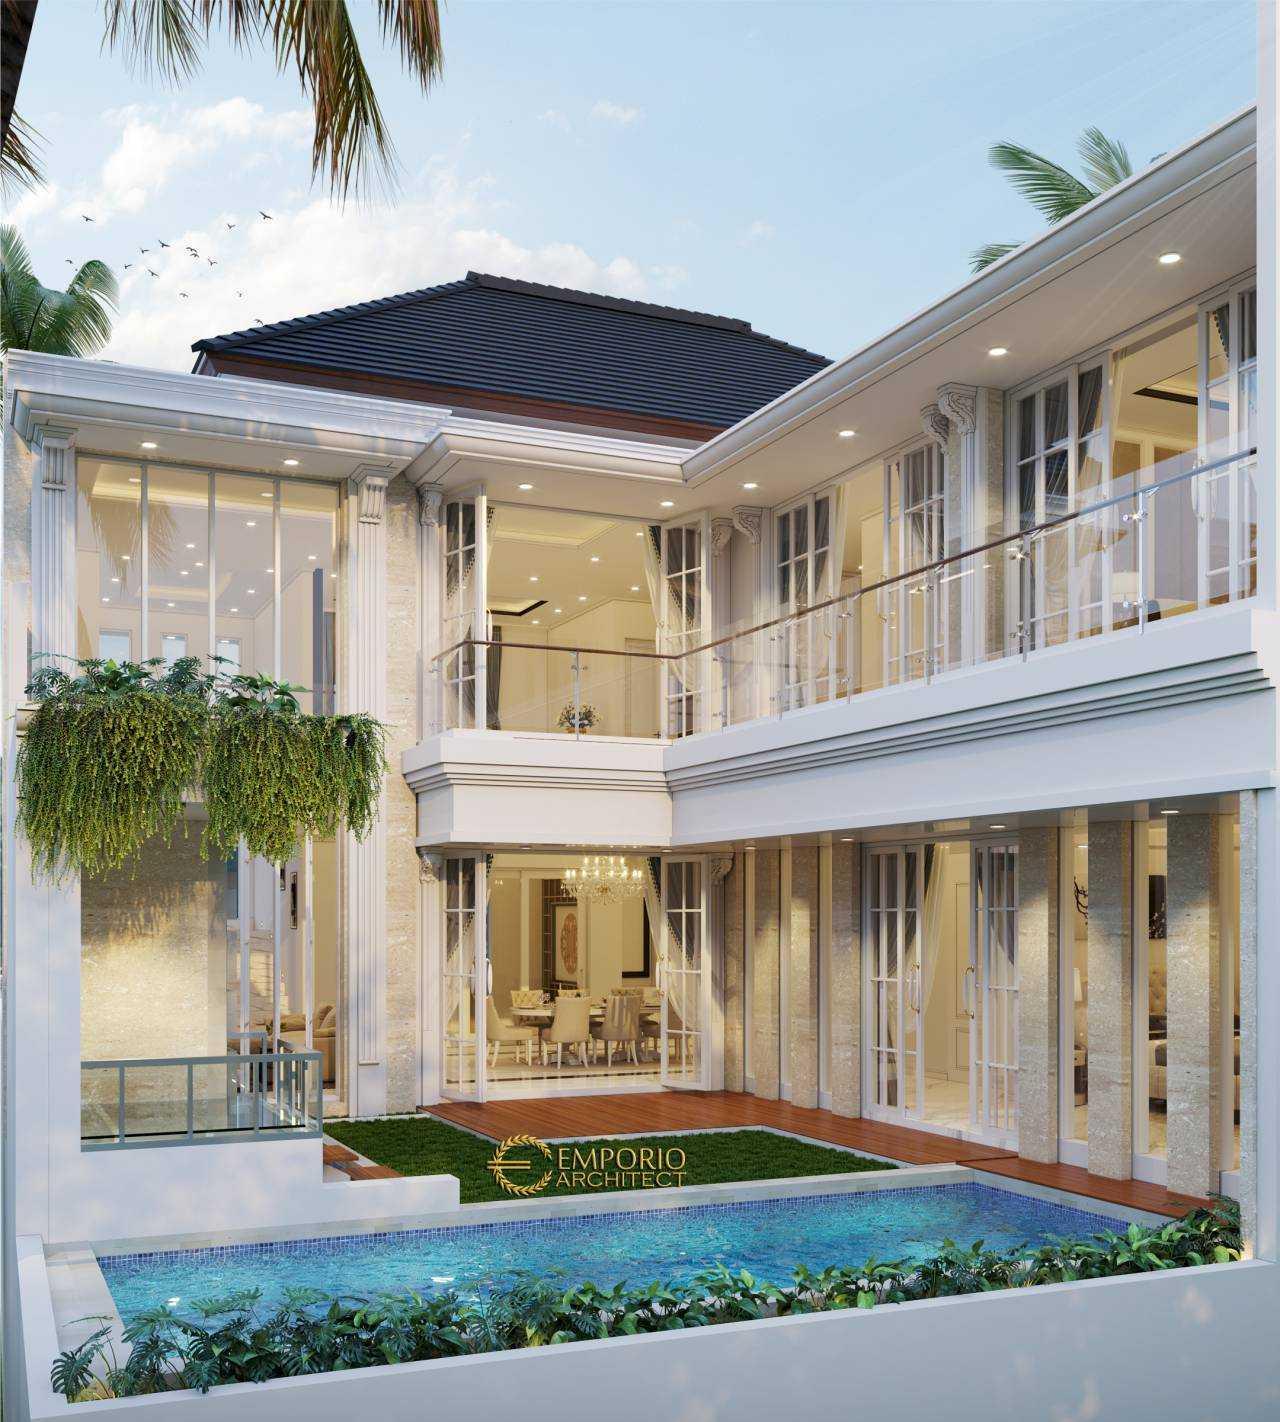 Emporio Architect Jasa Arsitek Tangerang Desain Rumah Classic 2 Lantai 797 @ Tangerang Tangerang, Kota Tangerang, Banten, Indonesia Tangerang, Kota Tangerang, Banten, Indonesia Emporio-Architect-Jasa-Arsitek-Tangerang-Desain-Rumah-Classic-2-Lantai-797-Tangerang  90647